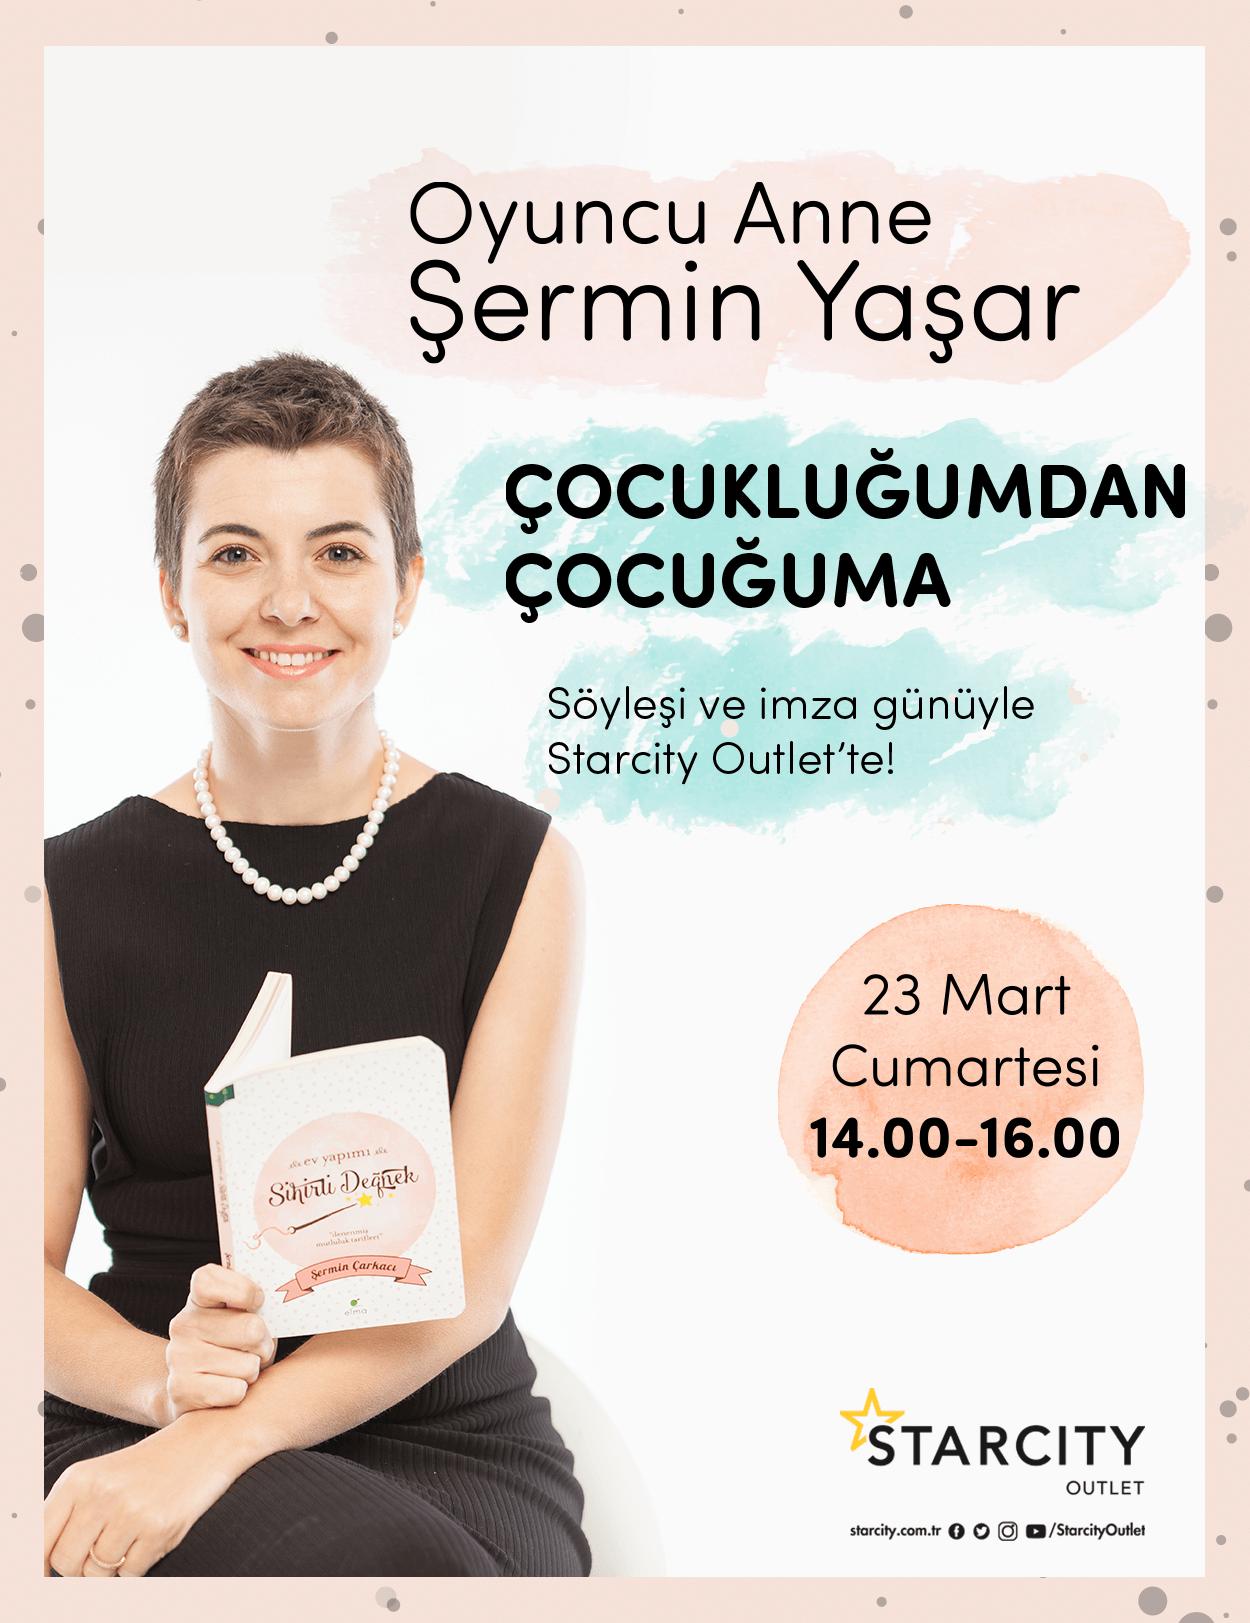 Oyuncu Anne Şermin Yaşar, Starcity Outlet'te